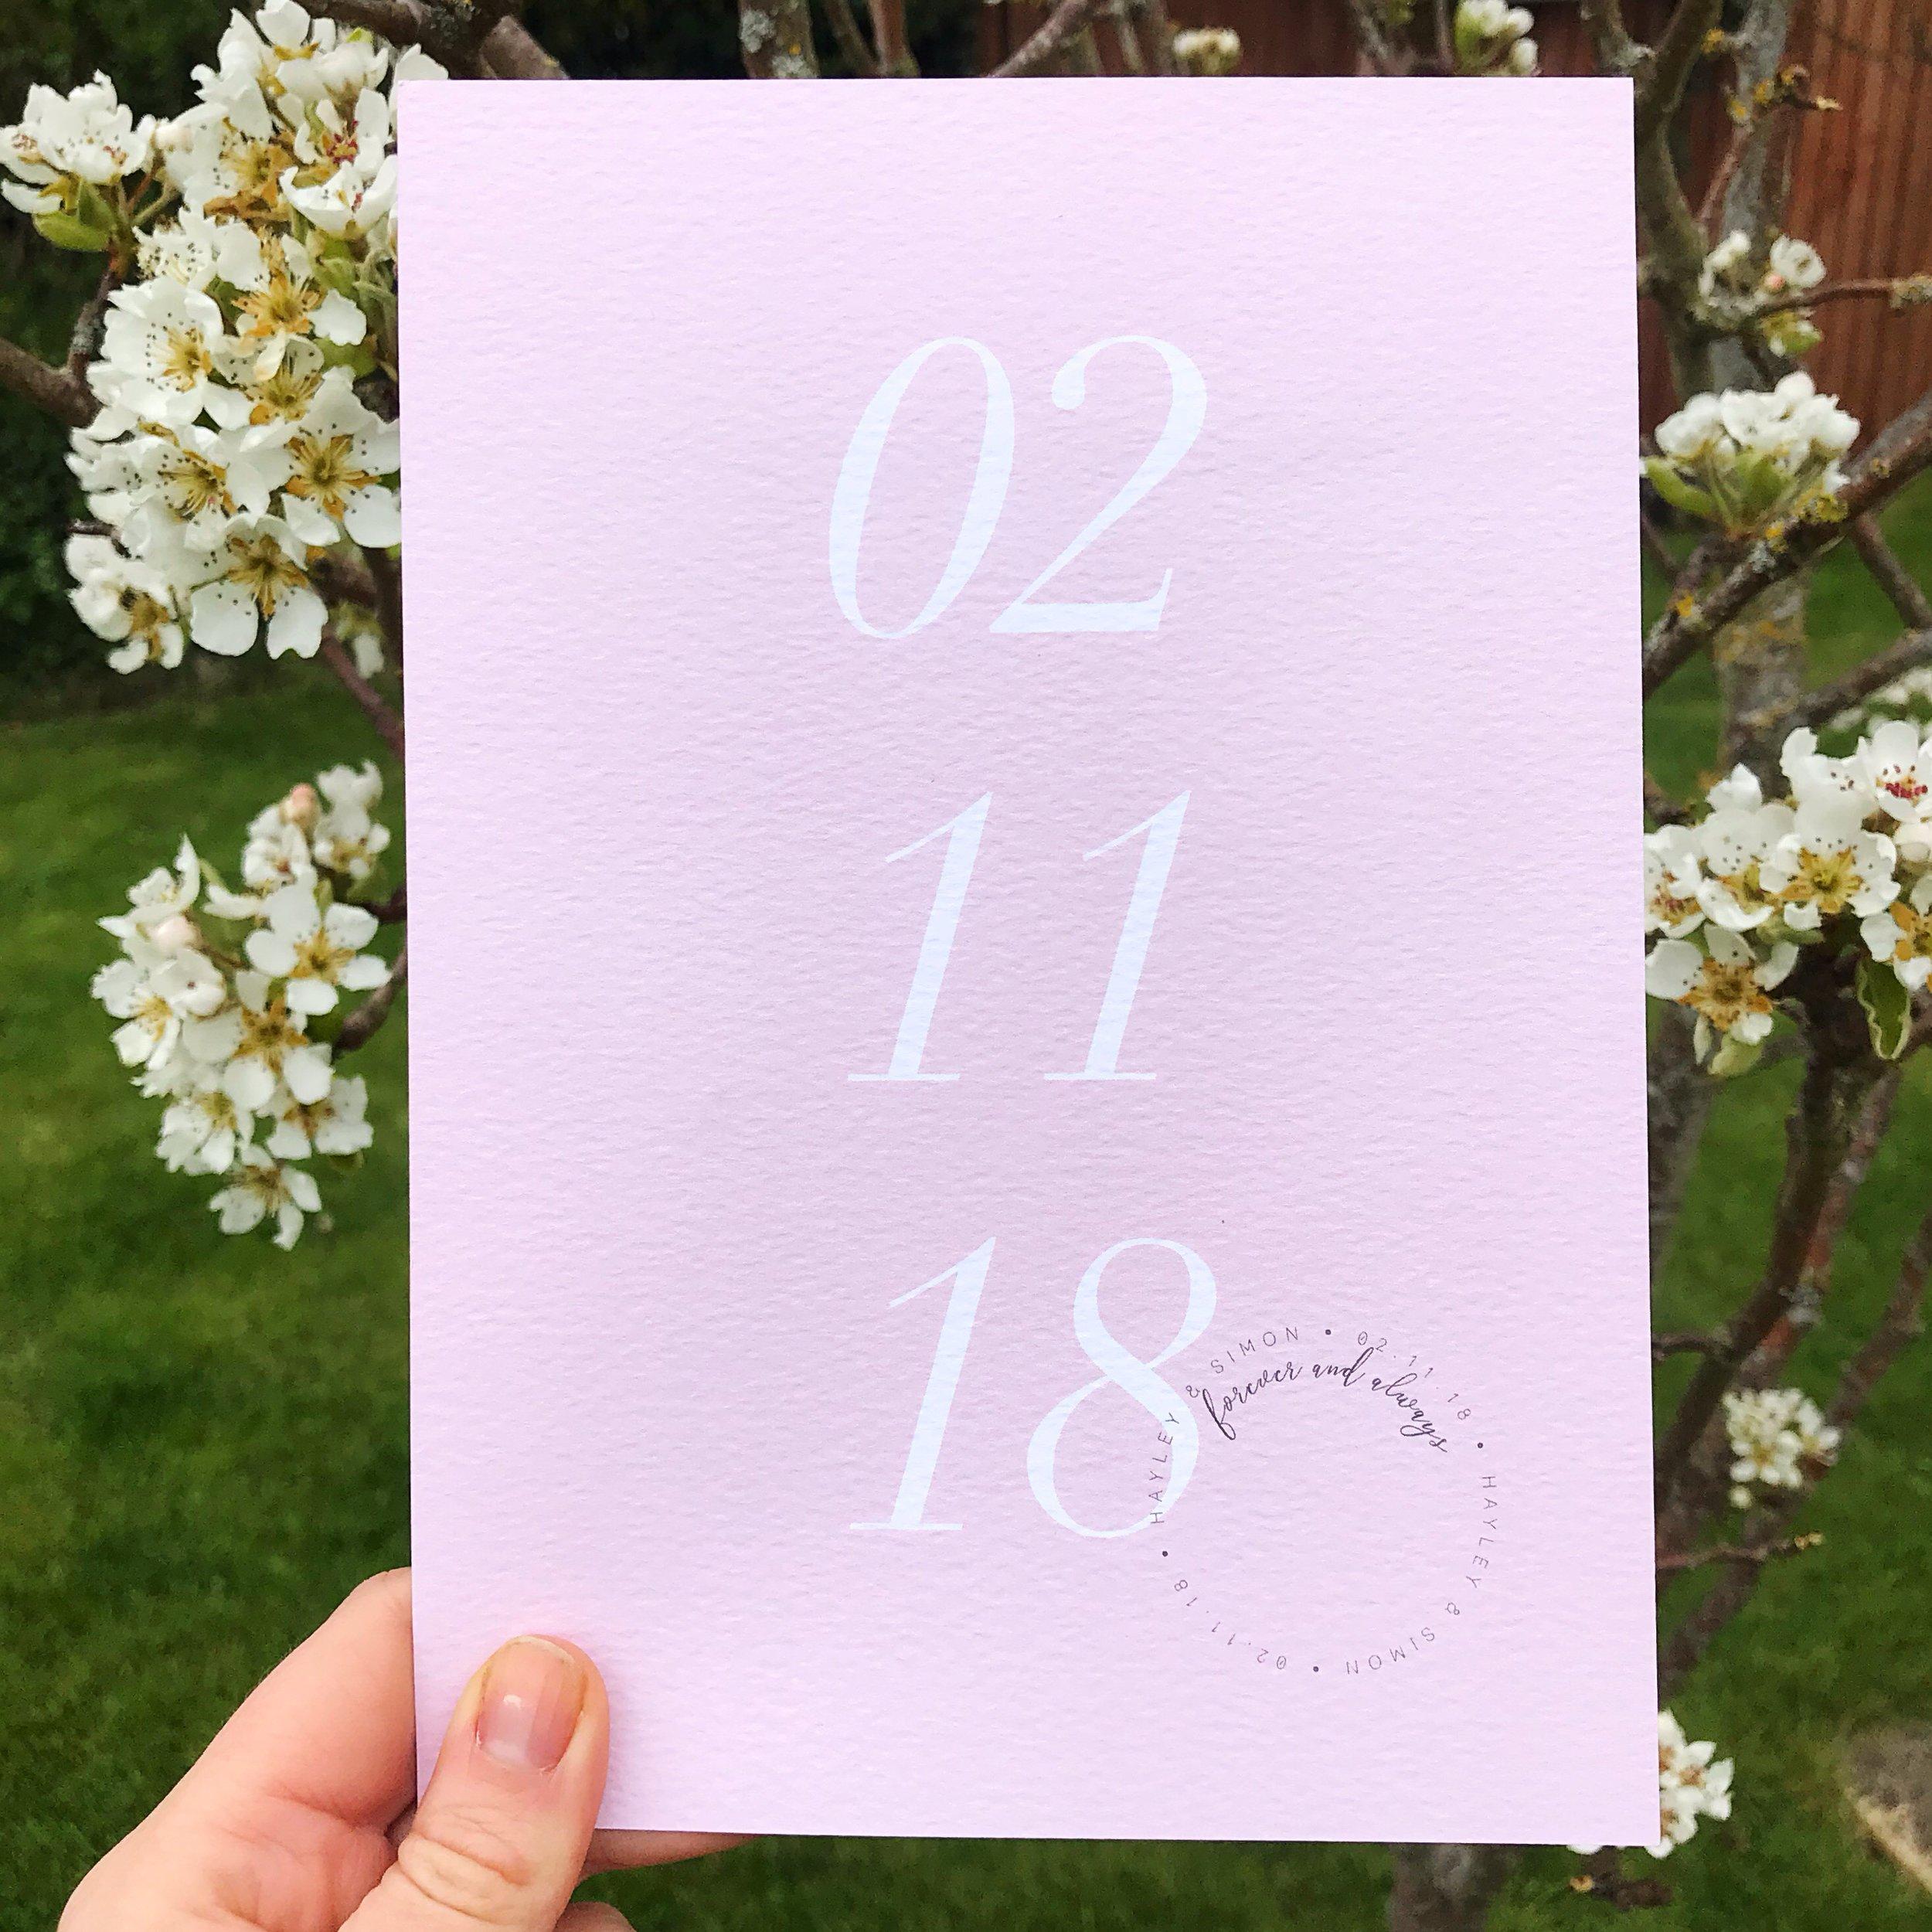 Pastel-pink-wedding-invite-white-roses-cheltenham-theinkcloset-back.jpg